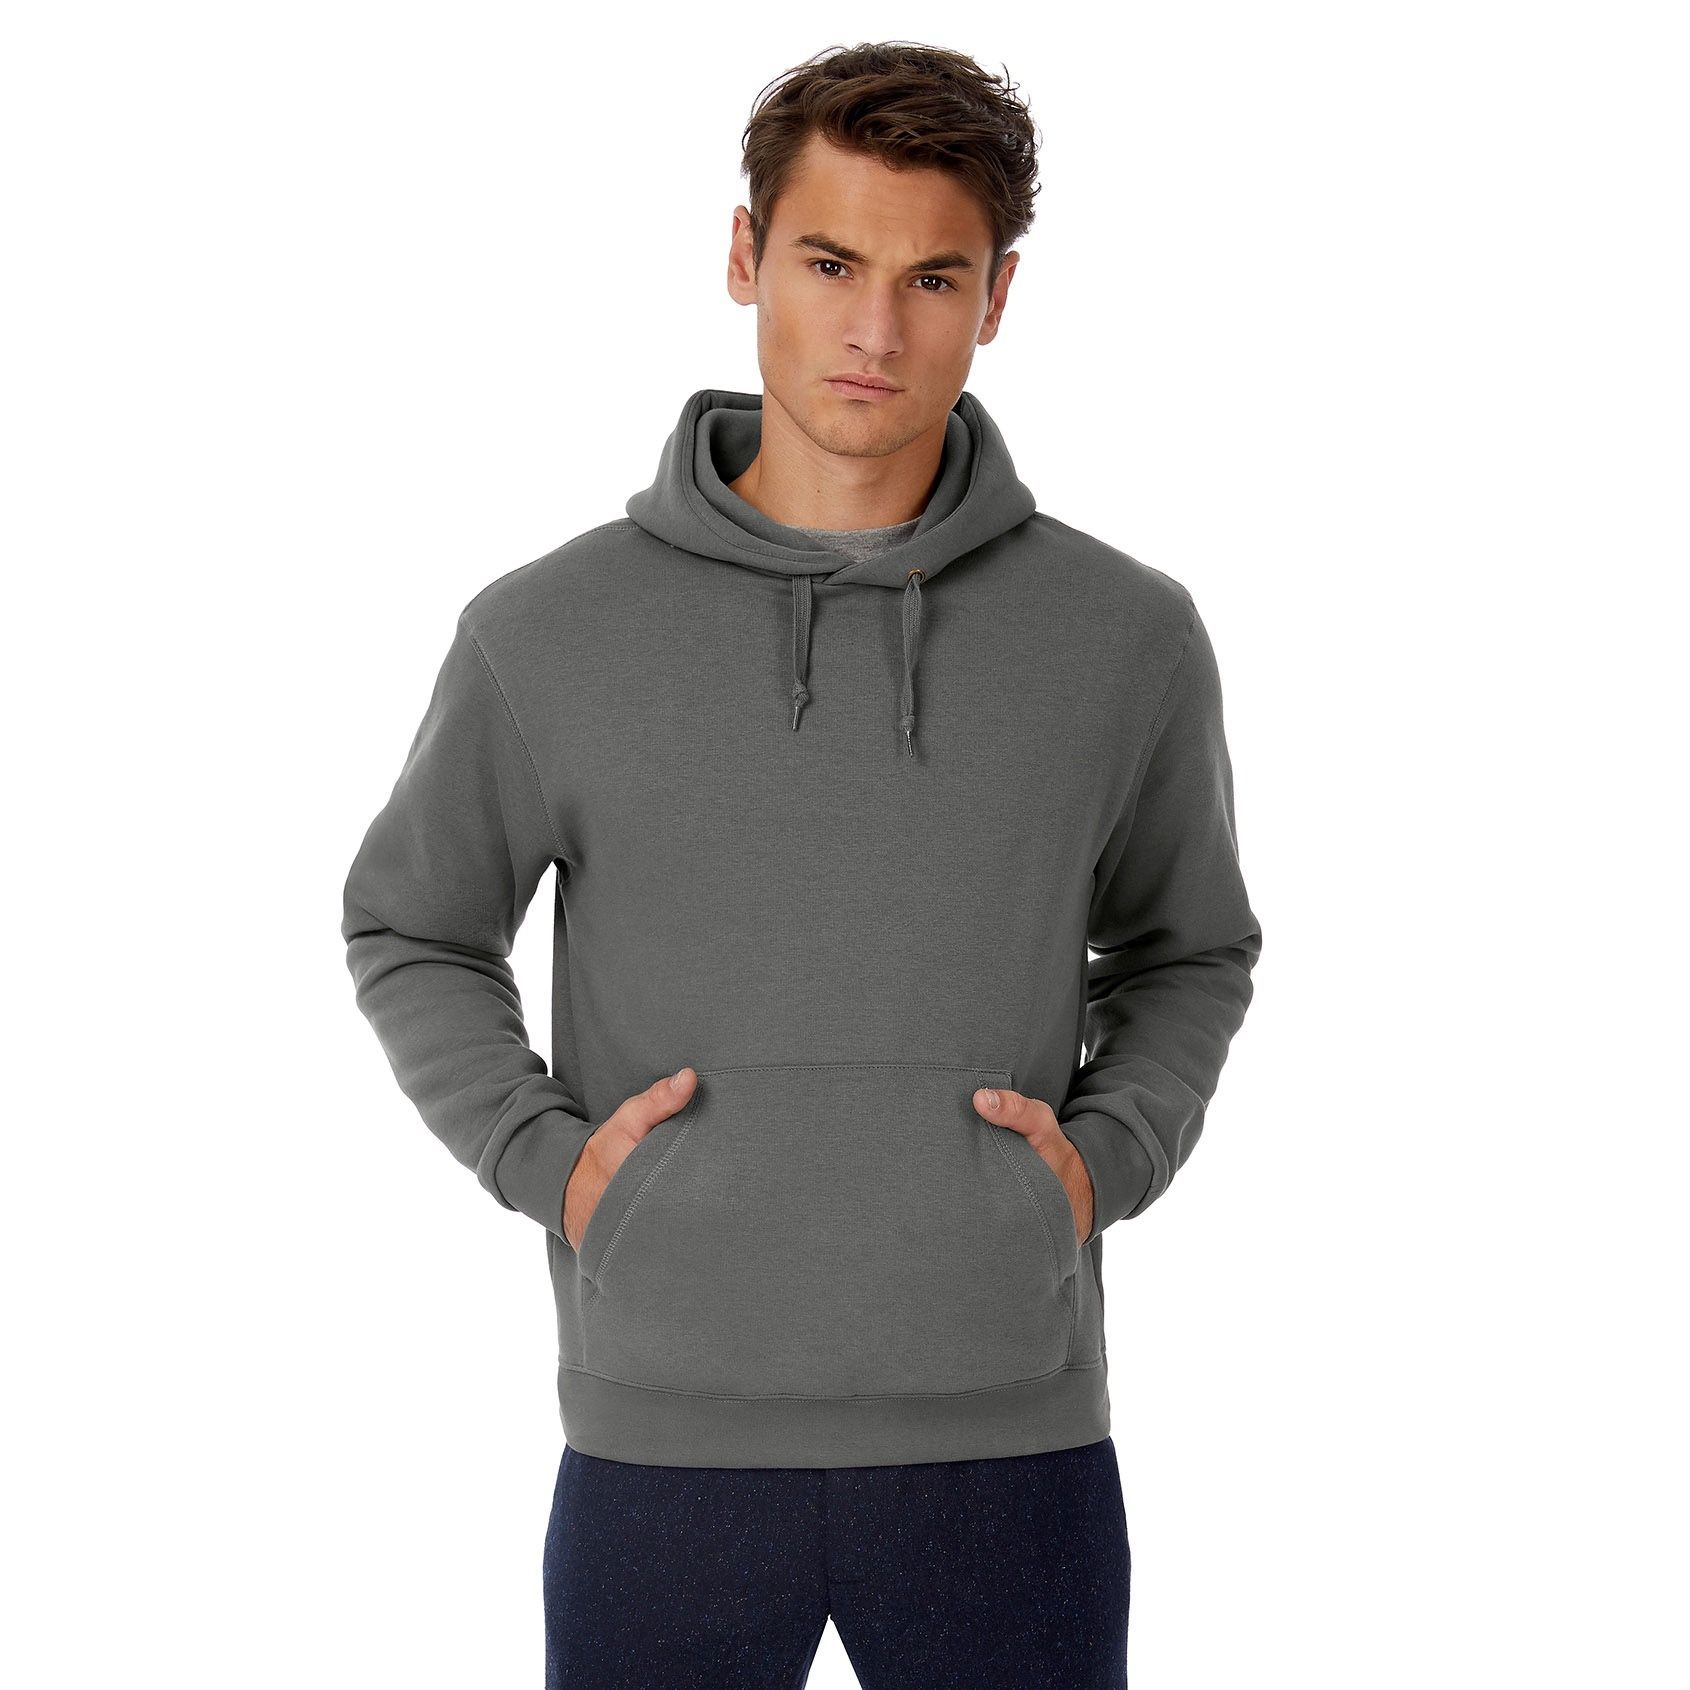 Small Hoodie Construction Engineer Boys Casual Soft Comfortable Sweatshirts Kangaroo Pocket Hoodies